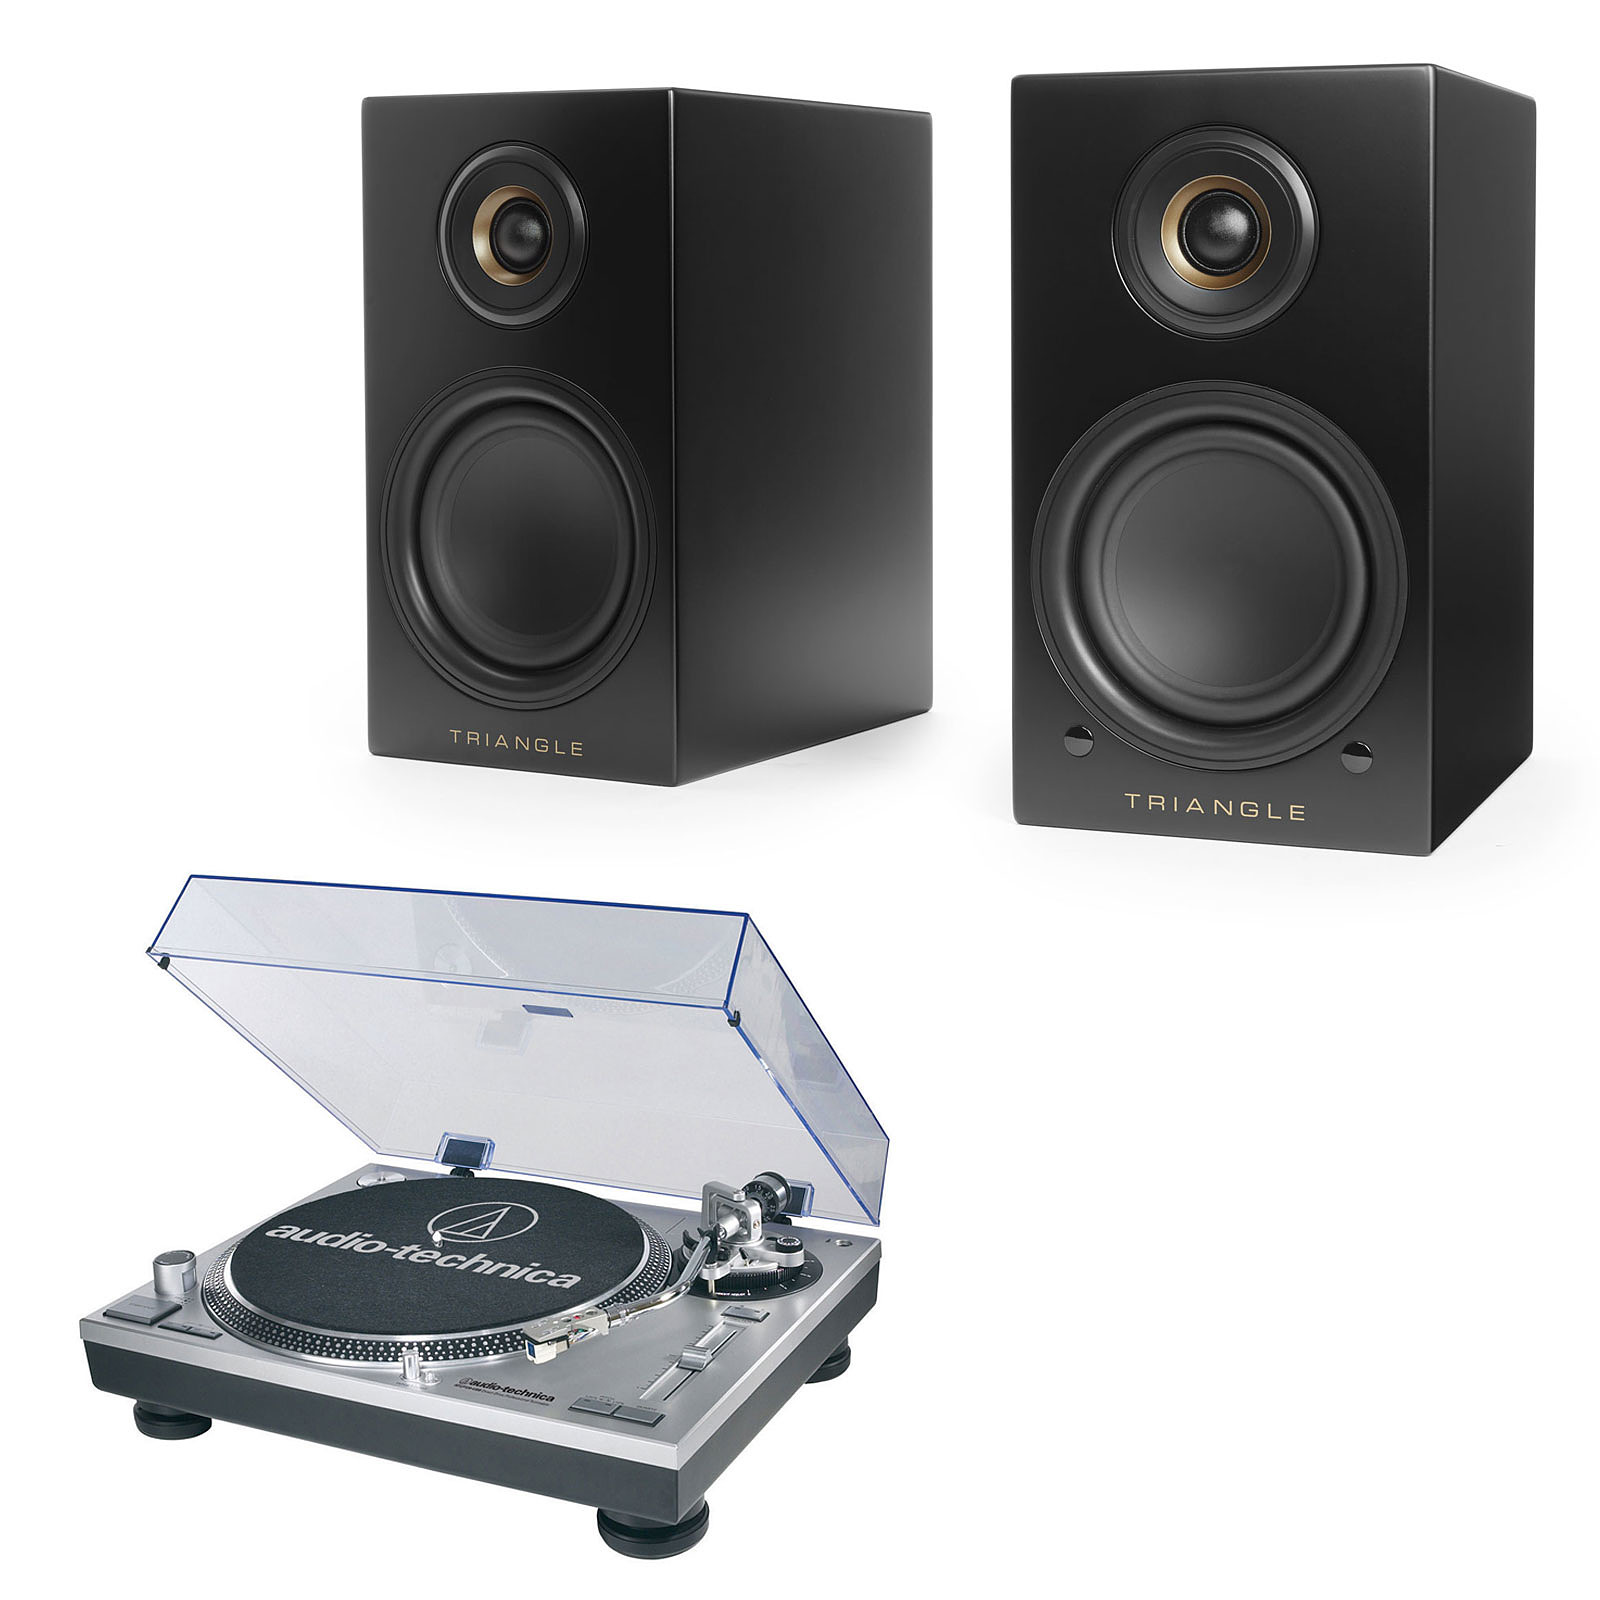 Audio-Technica AT-LP120USBHC + Triangle Elara LN01A Noir mat